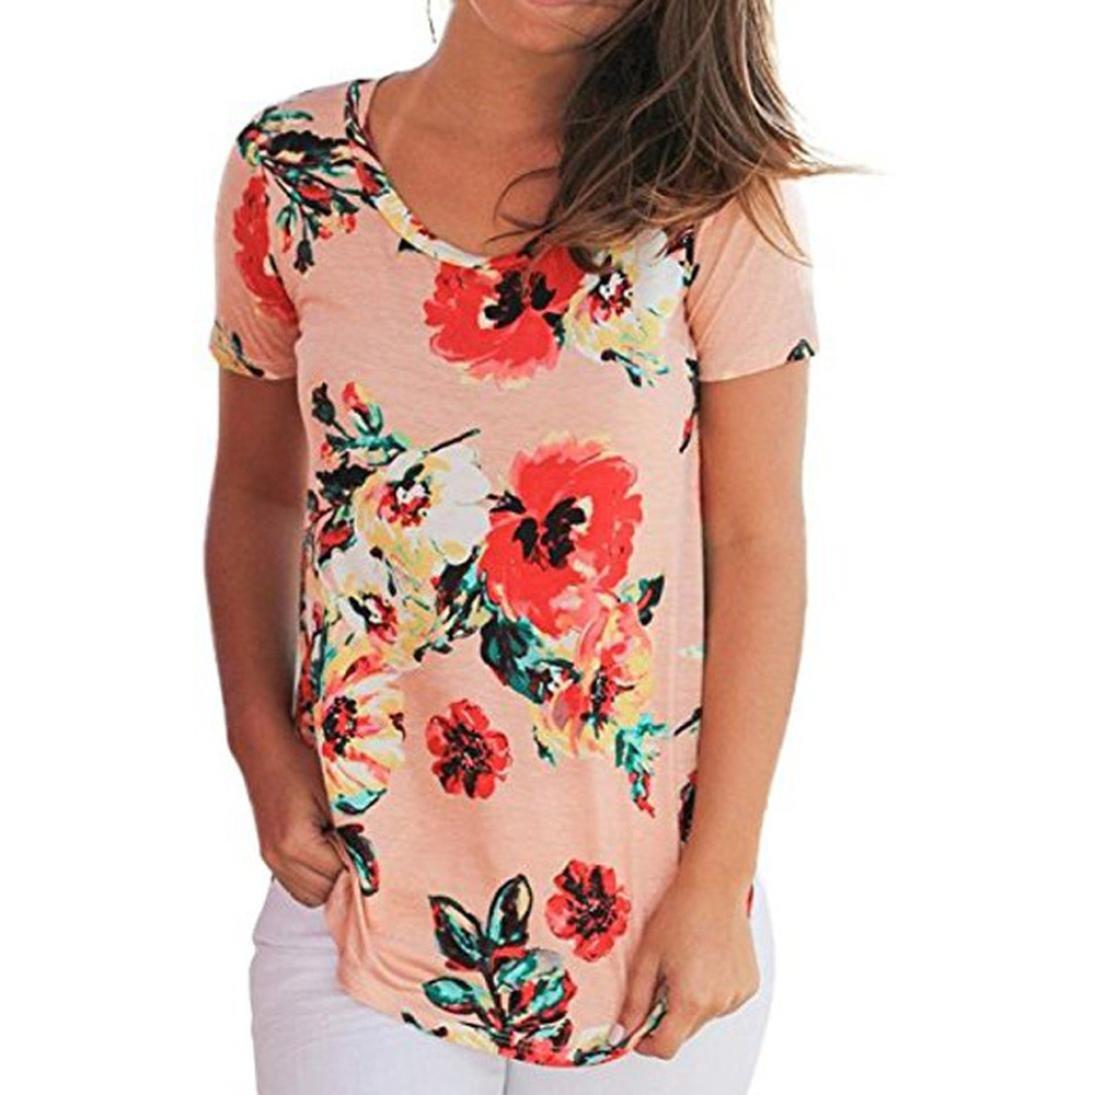 e2193b58d14 Highpot Summer Elegant Women Pink Rose Prints Short Sleeve T-shirt Tops  Blouse at Amazon Women s Clothing store